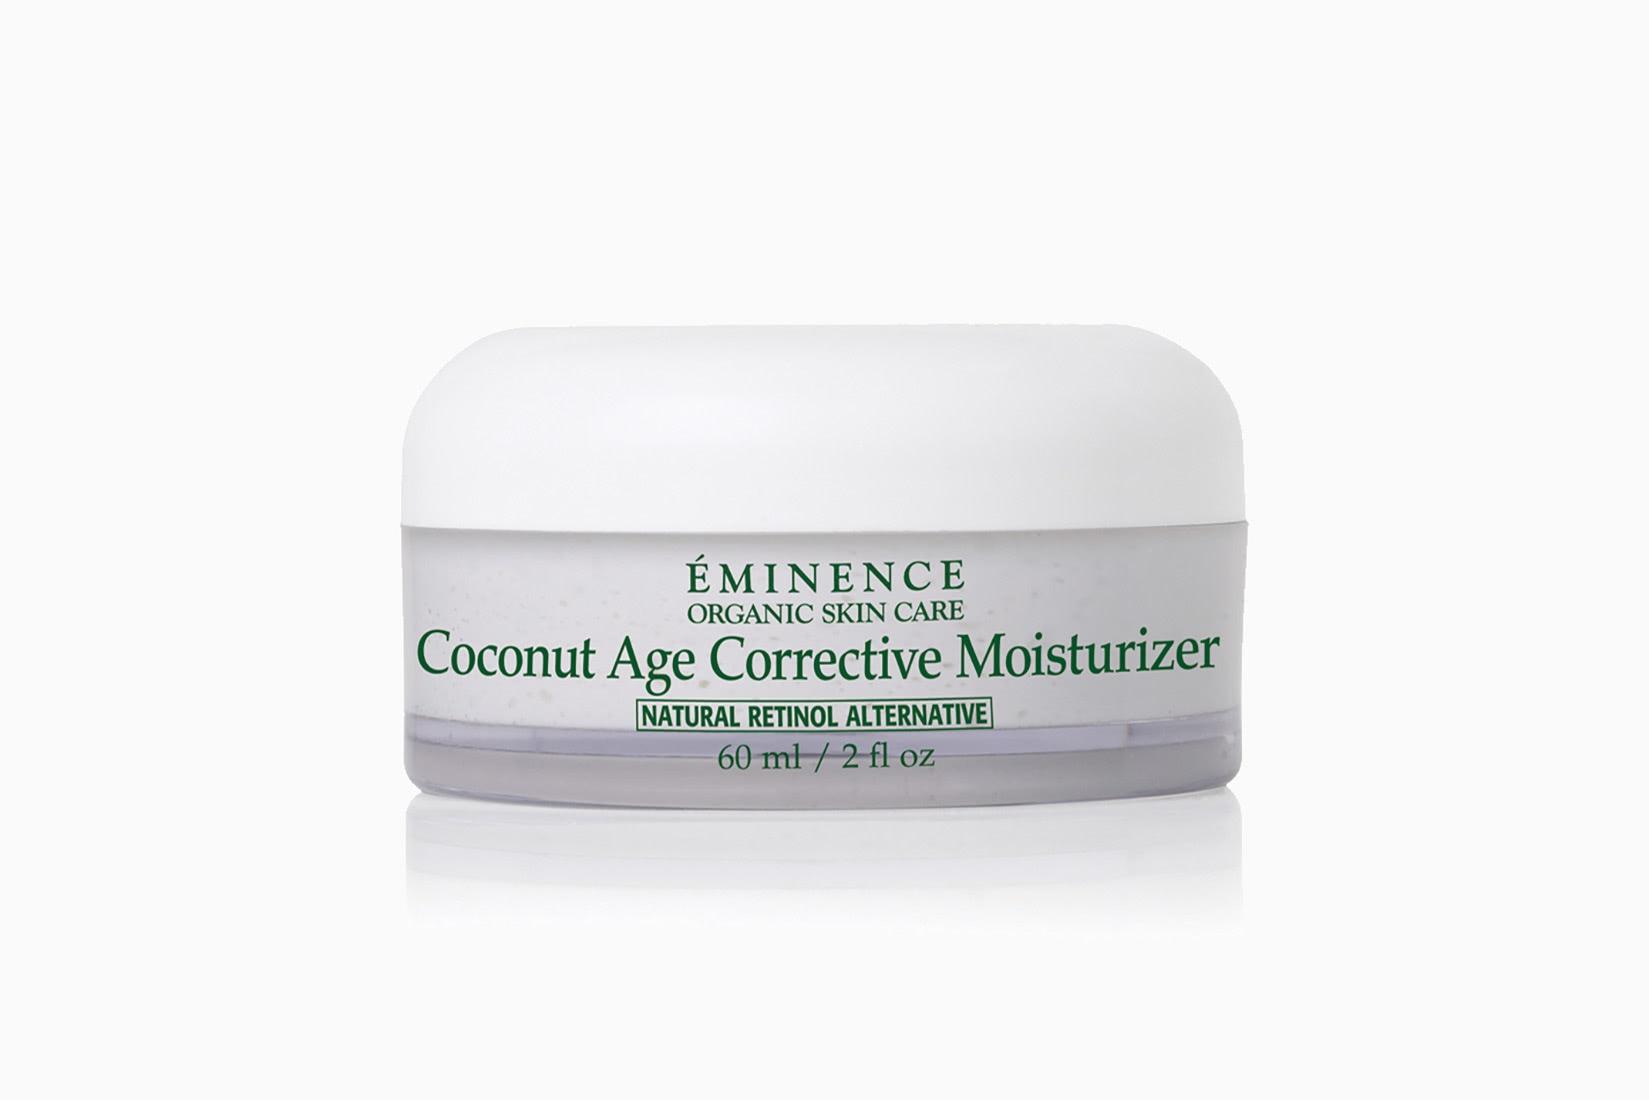 best natural organic beauty skincare eminence organics coconut moisturiser - Luxe Digital